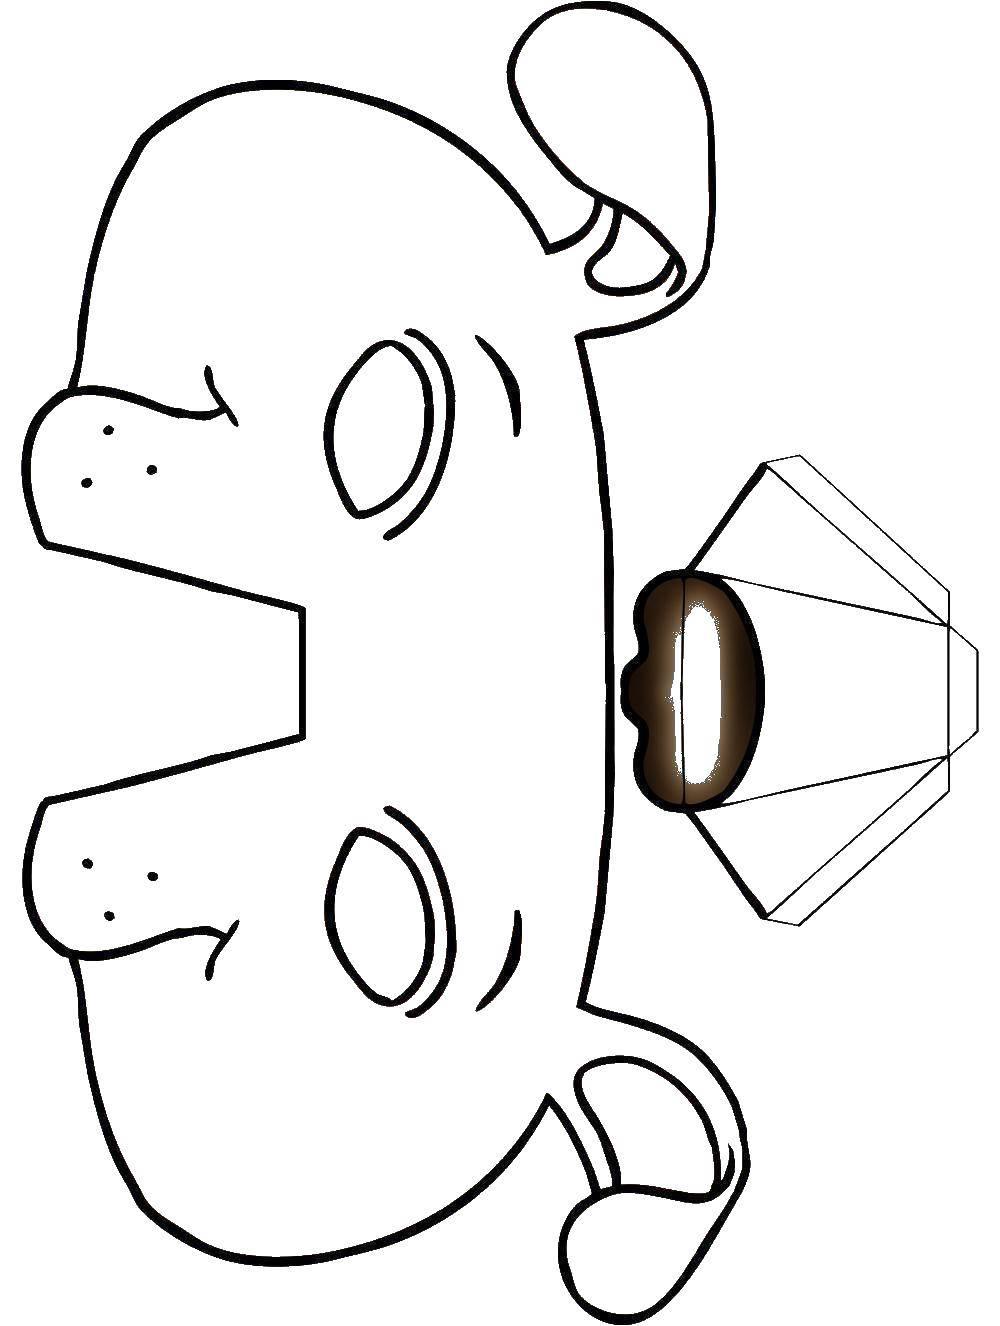 Раскраска Маска собаки Скачать ,маска, собака,.  Распечатать